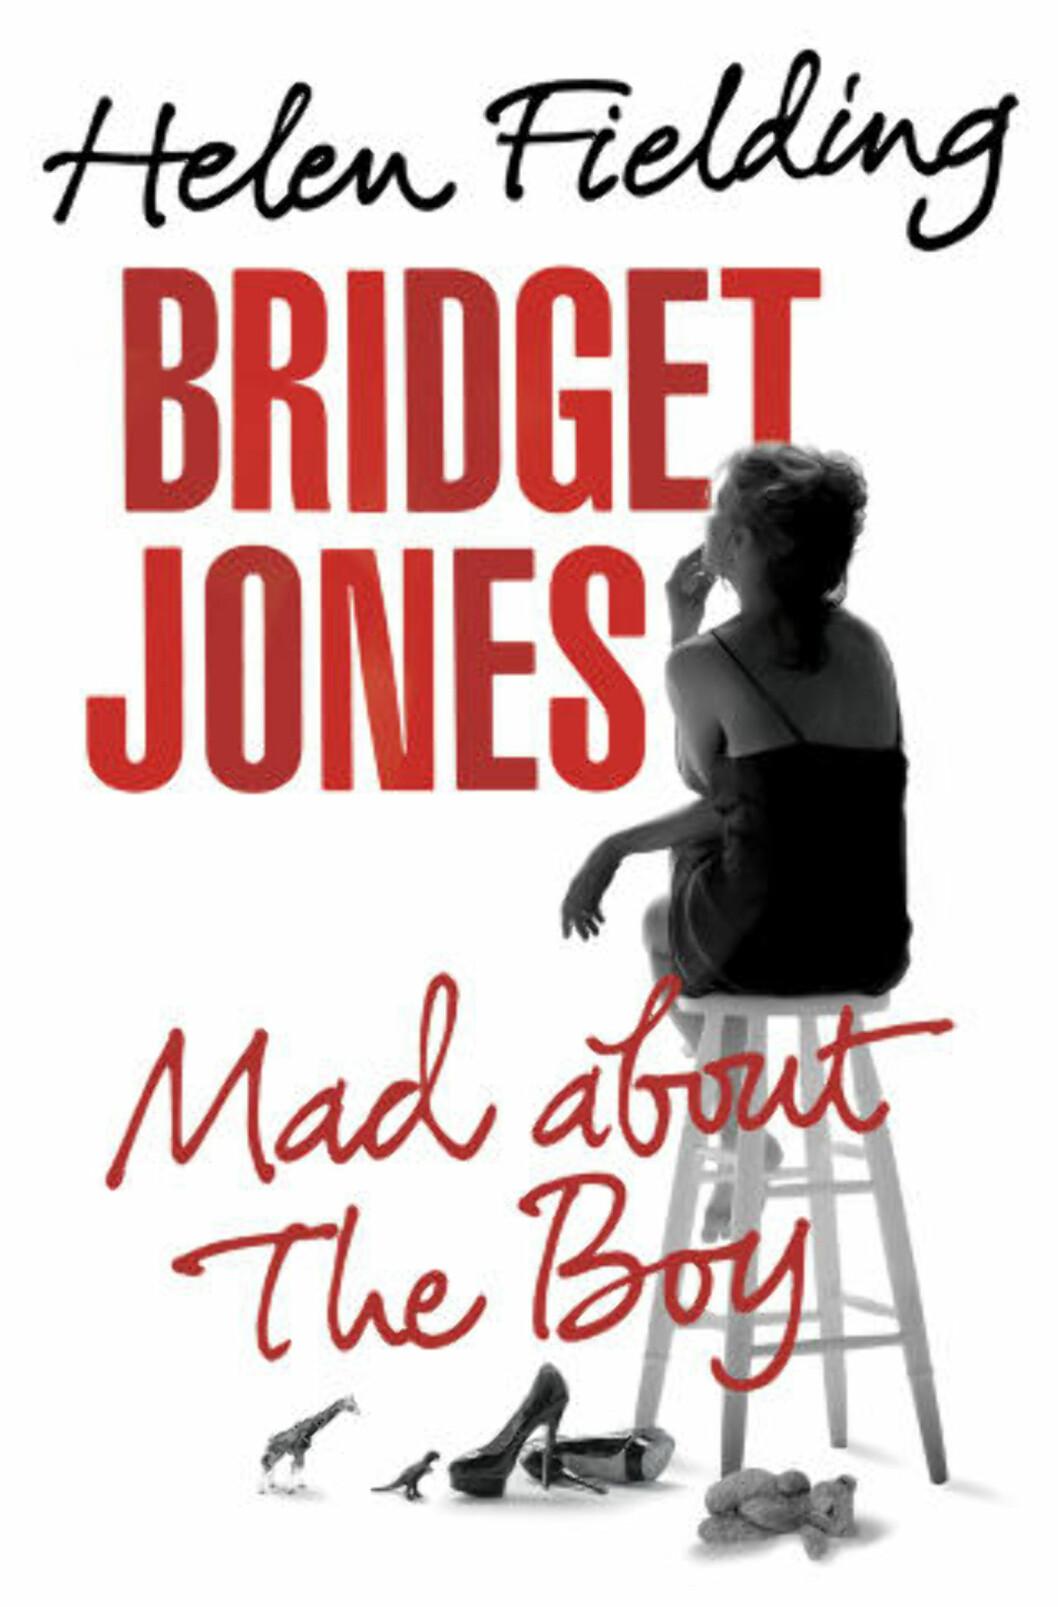 TREDJE BOK: Den tredje boka i serien om Bridget Jones kommer ut 10. oktober. Foto: Scanpix